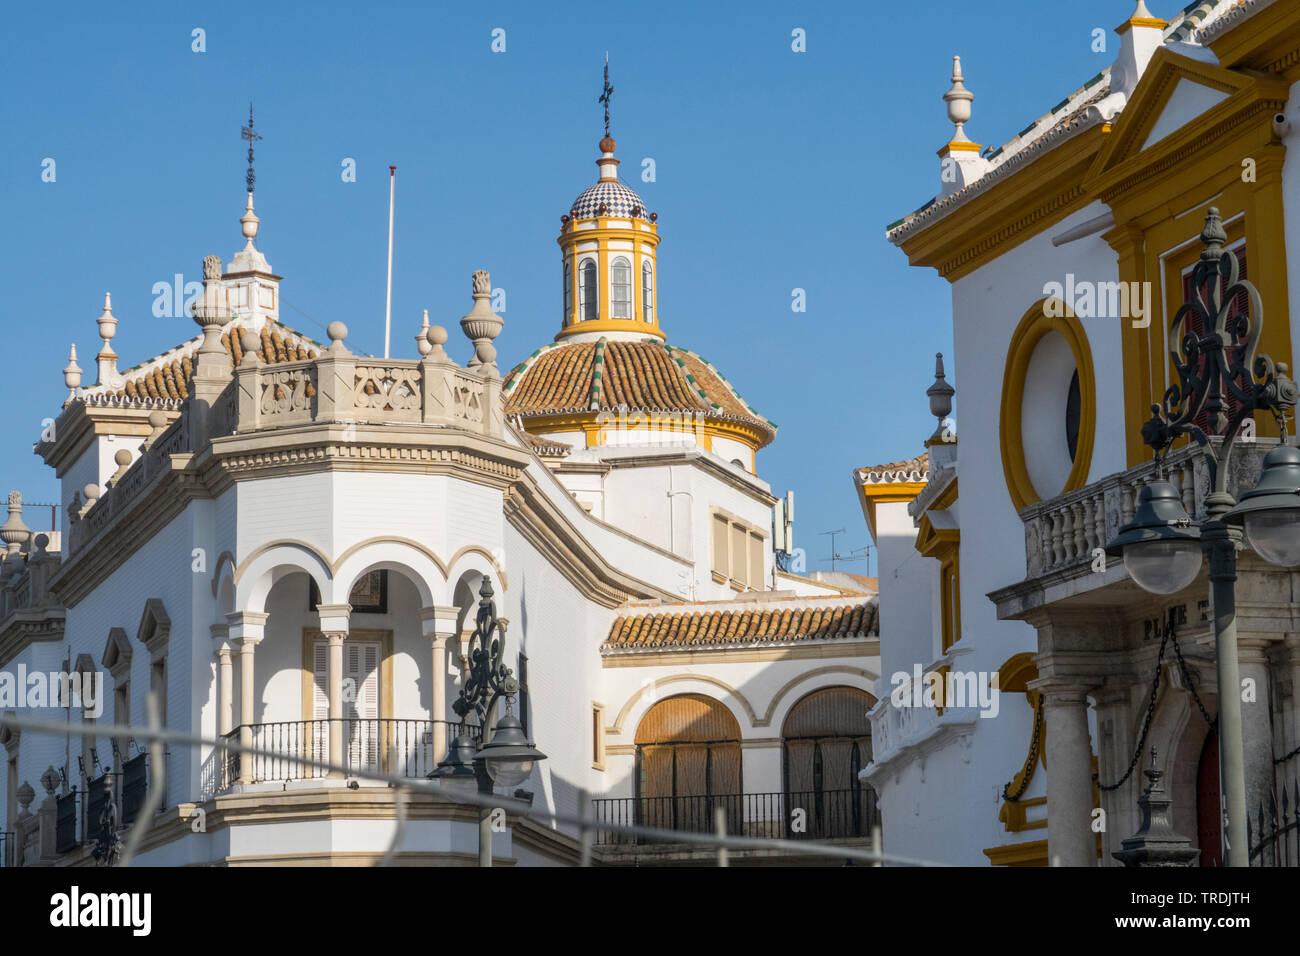 Seville Plaza de Toros de la Real Maestranza de Caballeria de Seville Bullring Spain,Seville - Stock Image